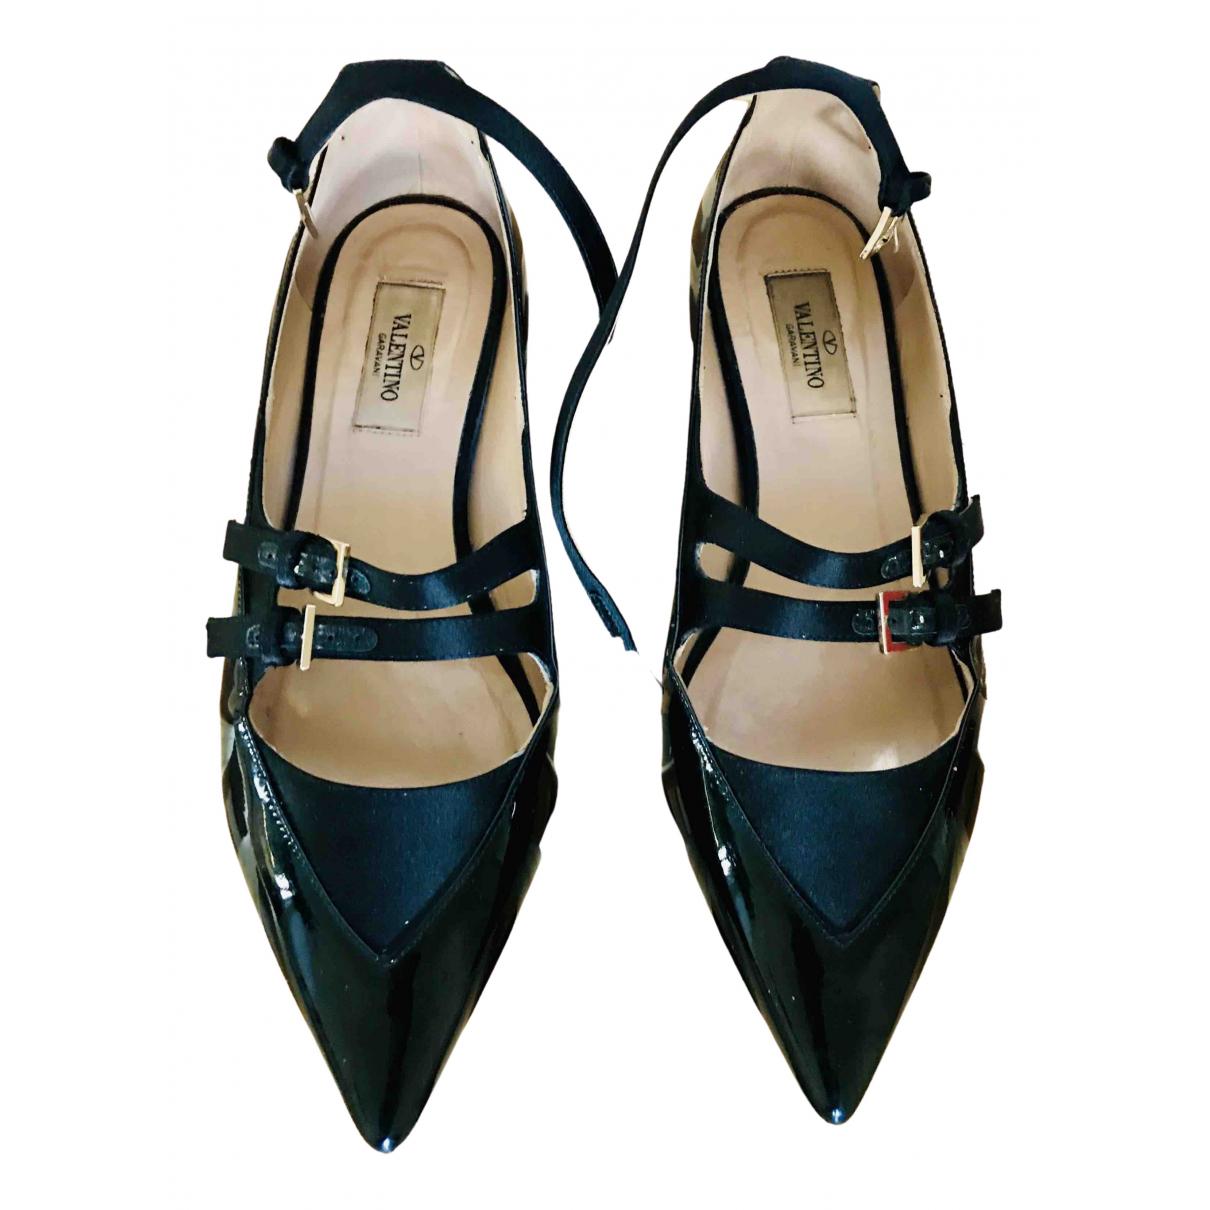 Valentino Garavani - Ballerines   pour femme en cuir verni - noir